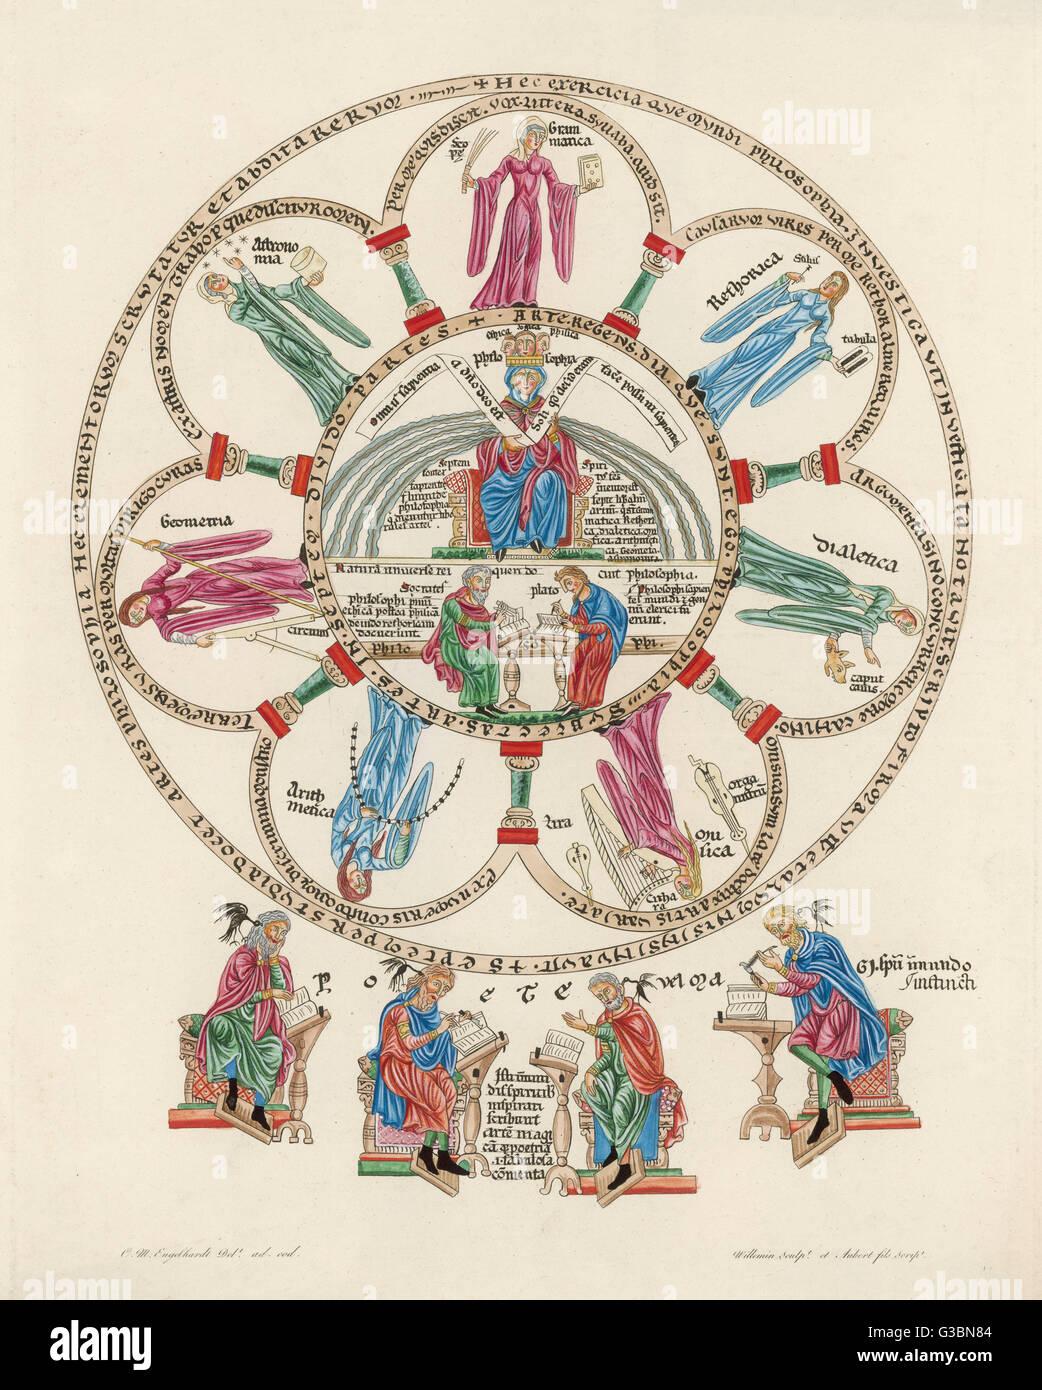 Philosophie thront, umgeben von den Wissenschaften - Grammatik, Rhetorik, Linguistik, Musik, Arithmetik, Geometrie Stockbild